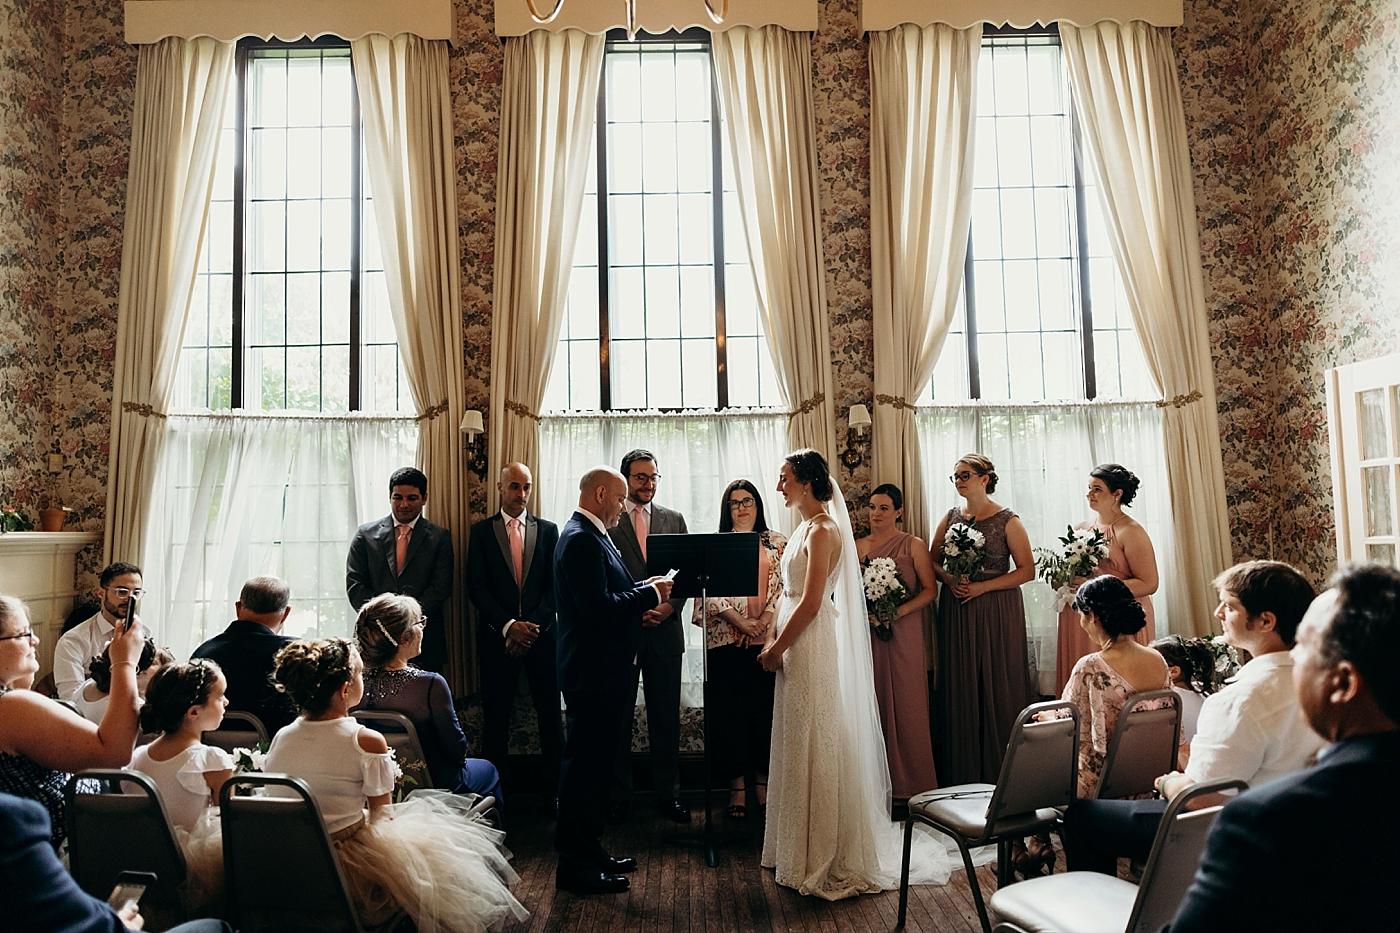 Chateau-Michelle-Wedding-Julia+JuanLuis_TheHeartlandersCo2018LA-4.jpg